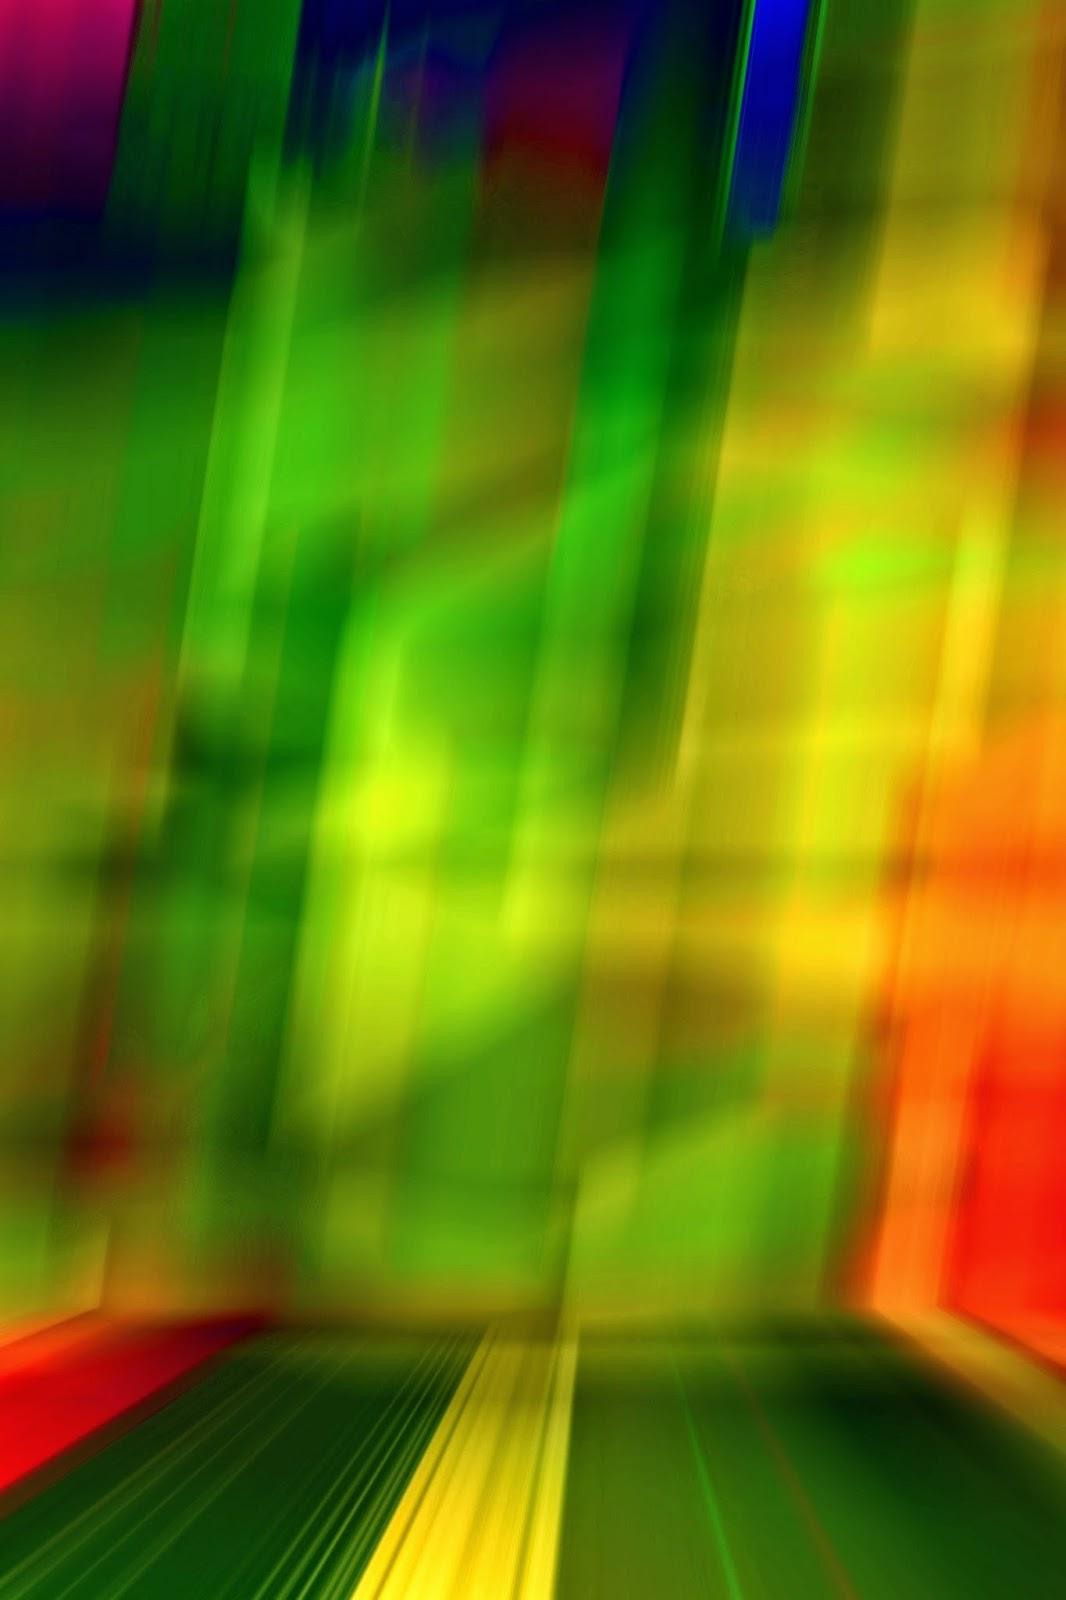 3d Holi Wallpapers Free Download Sanjay Photo World Digital Studio Backgrounds Vol 07